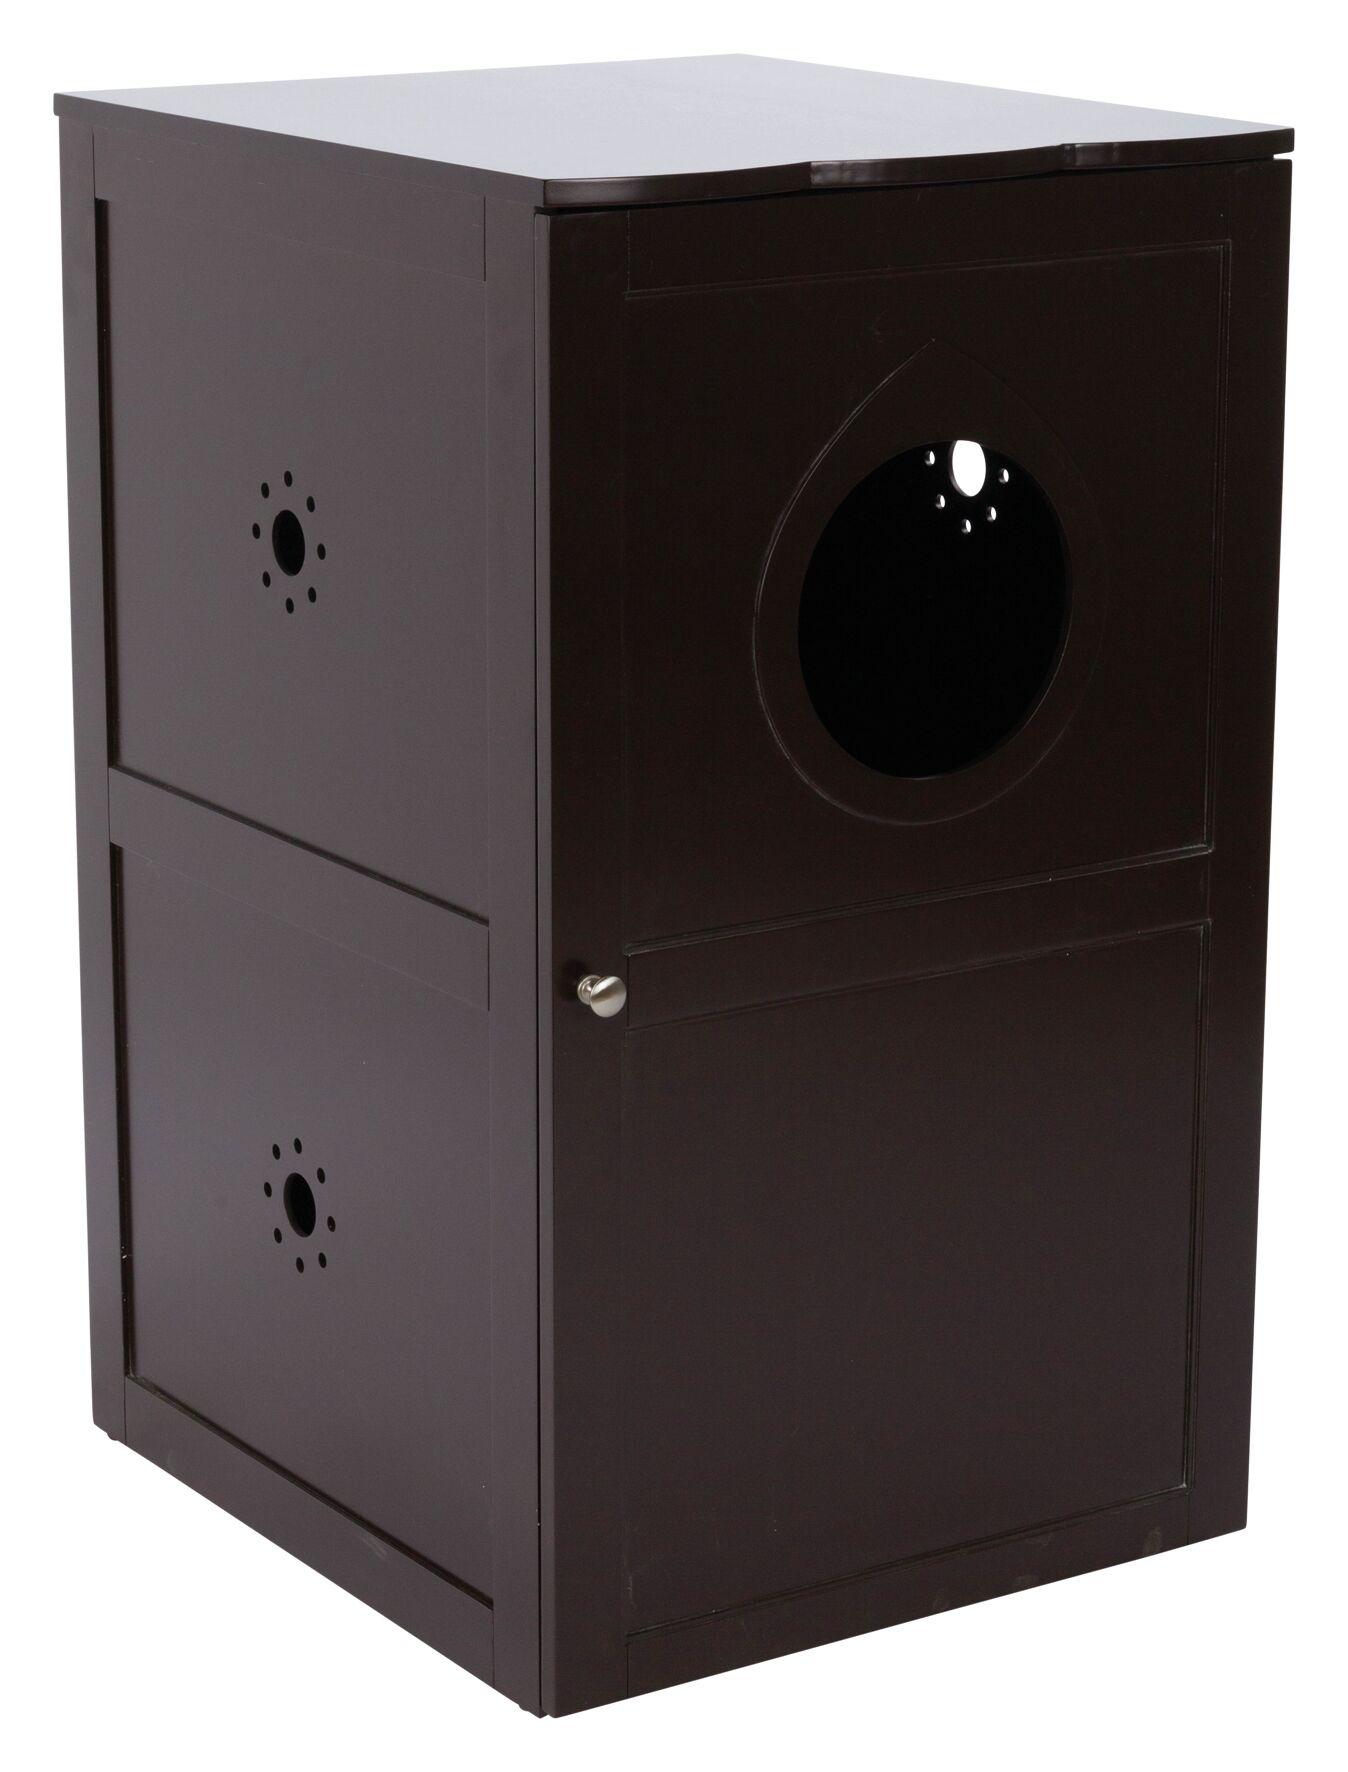 Gamma Litter Box Enclosure Color: Brown